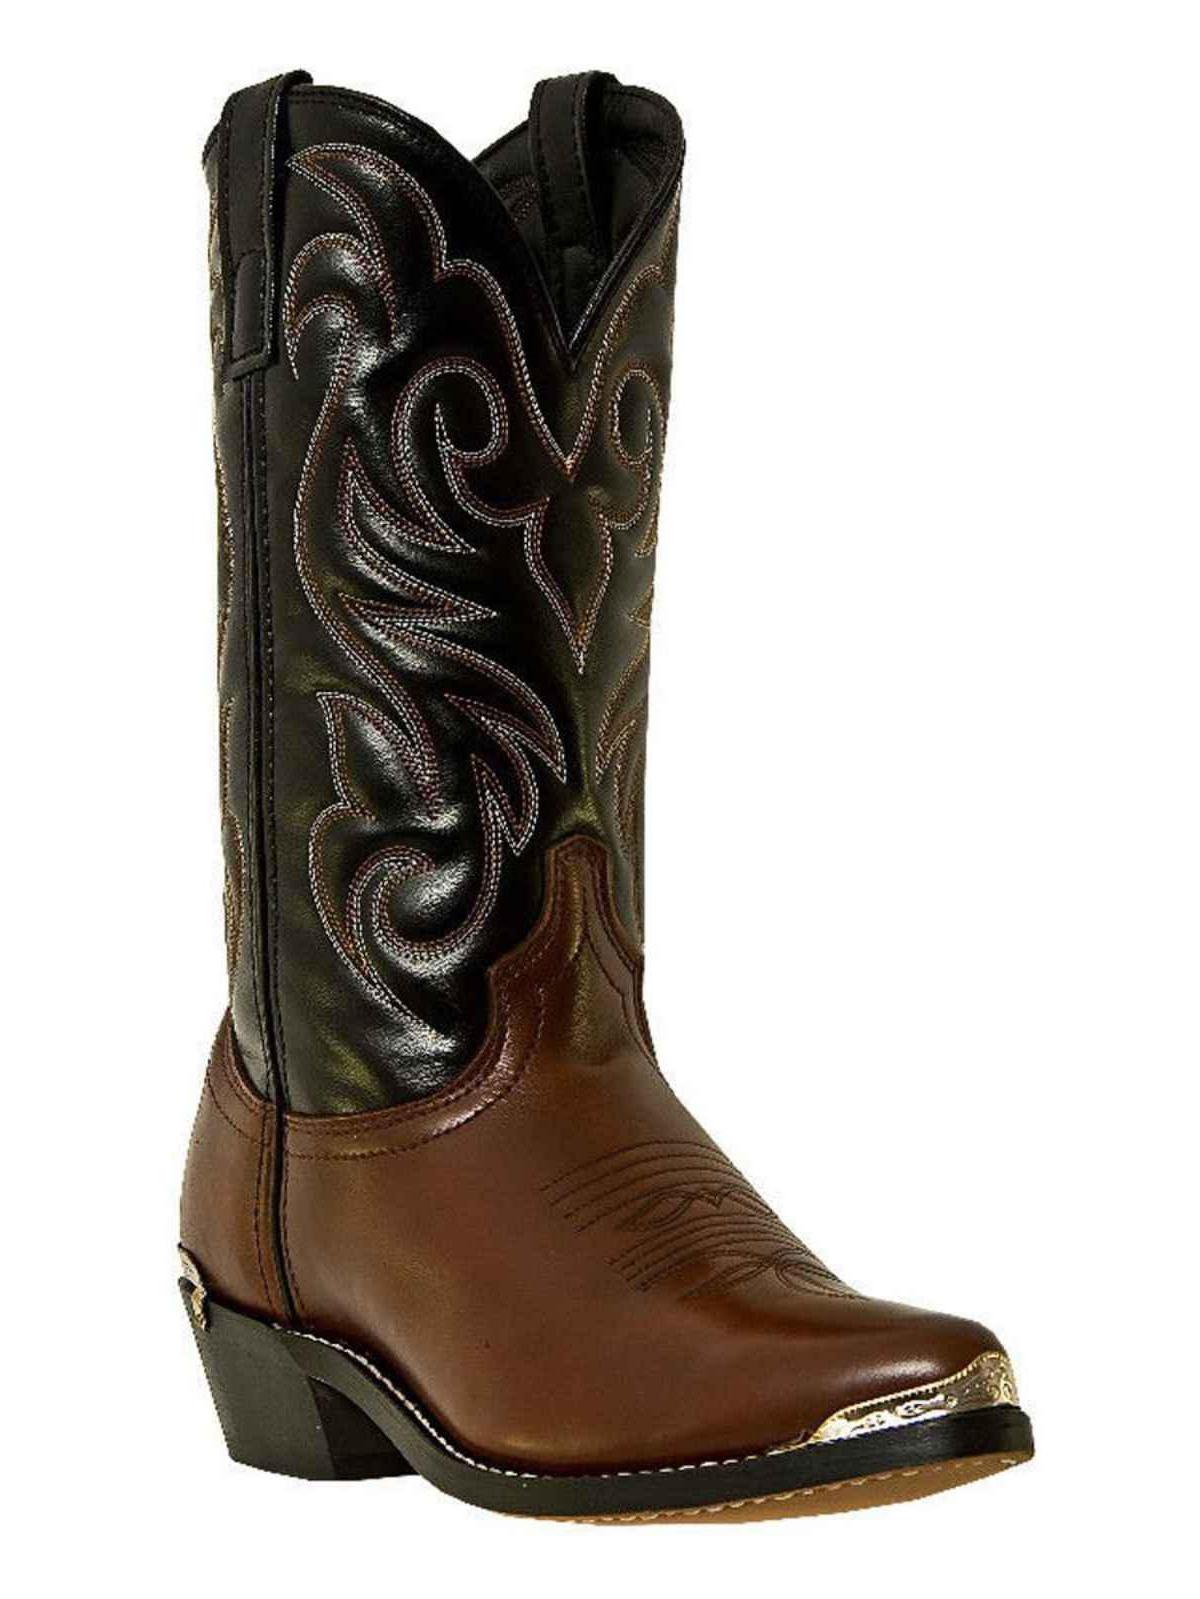 Laredo 28-2464 Men's Peanut and Black Nashville Western Boots by Laredo